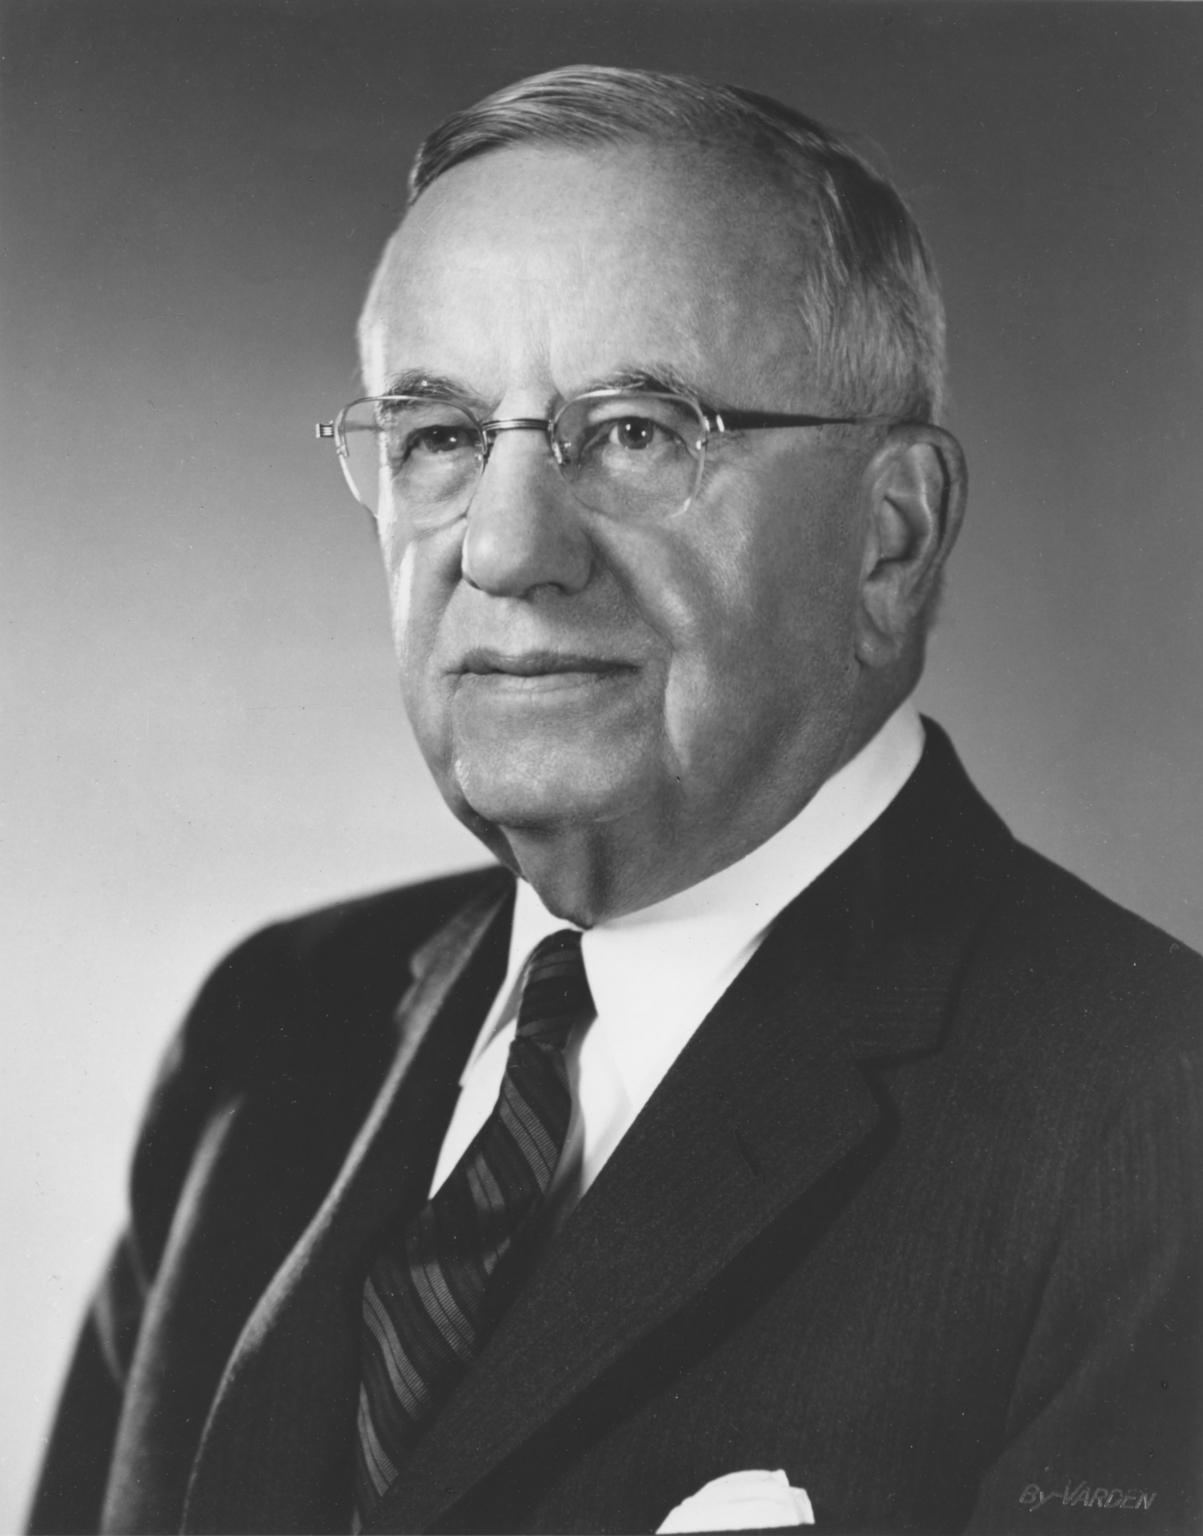 M. Herbert Eisenhart